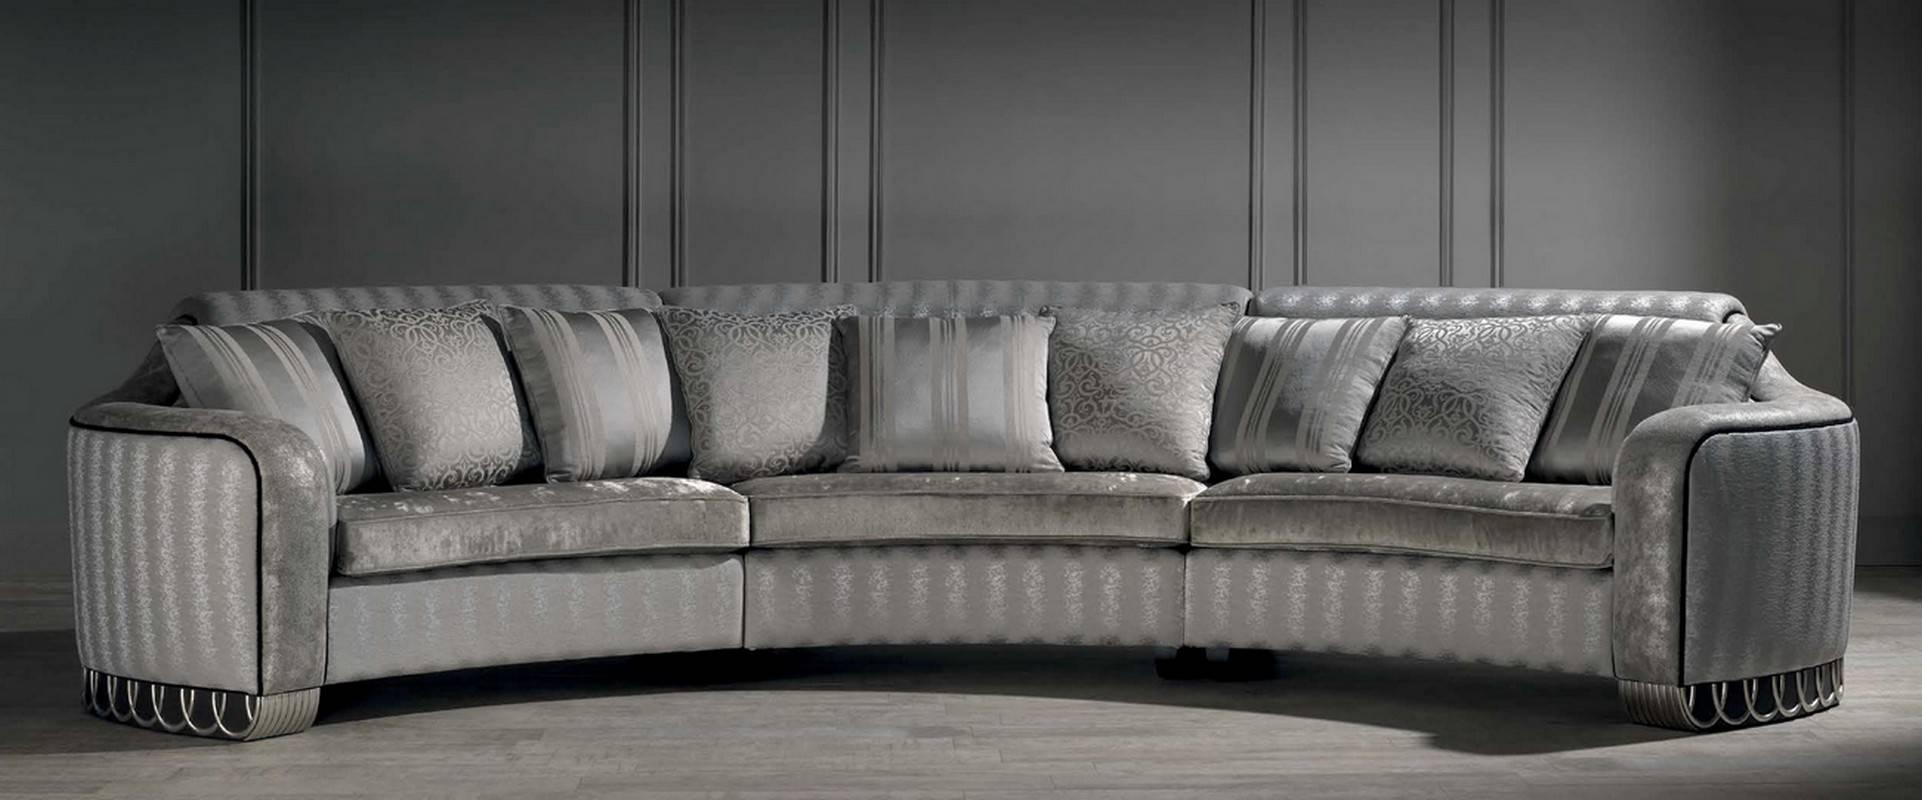 rattan half moon sofa set with storage underneath uk the best sofas